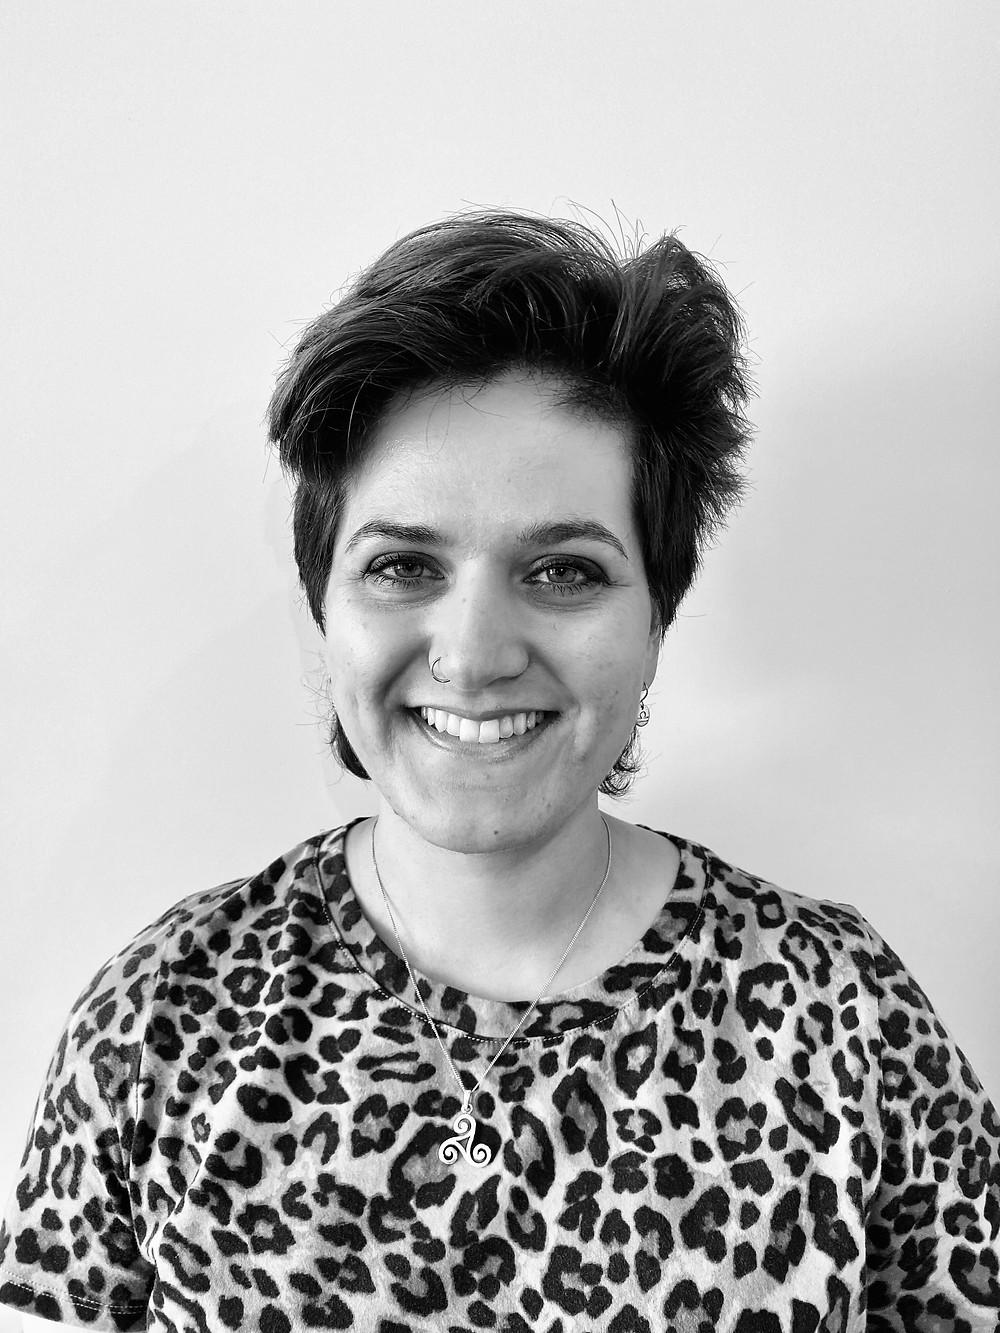 Media Precinct's Kate Farquharson